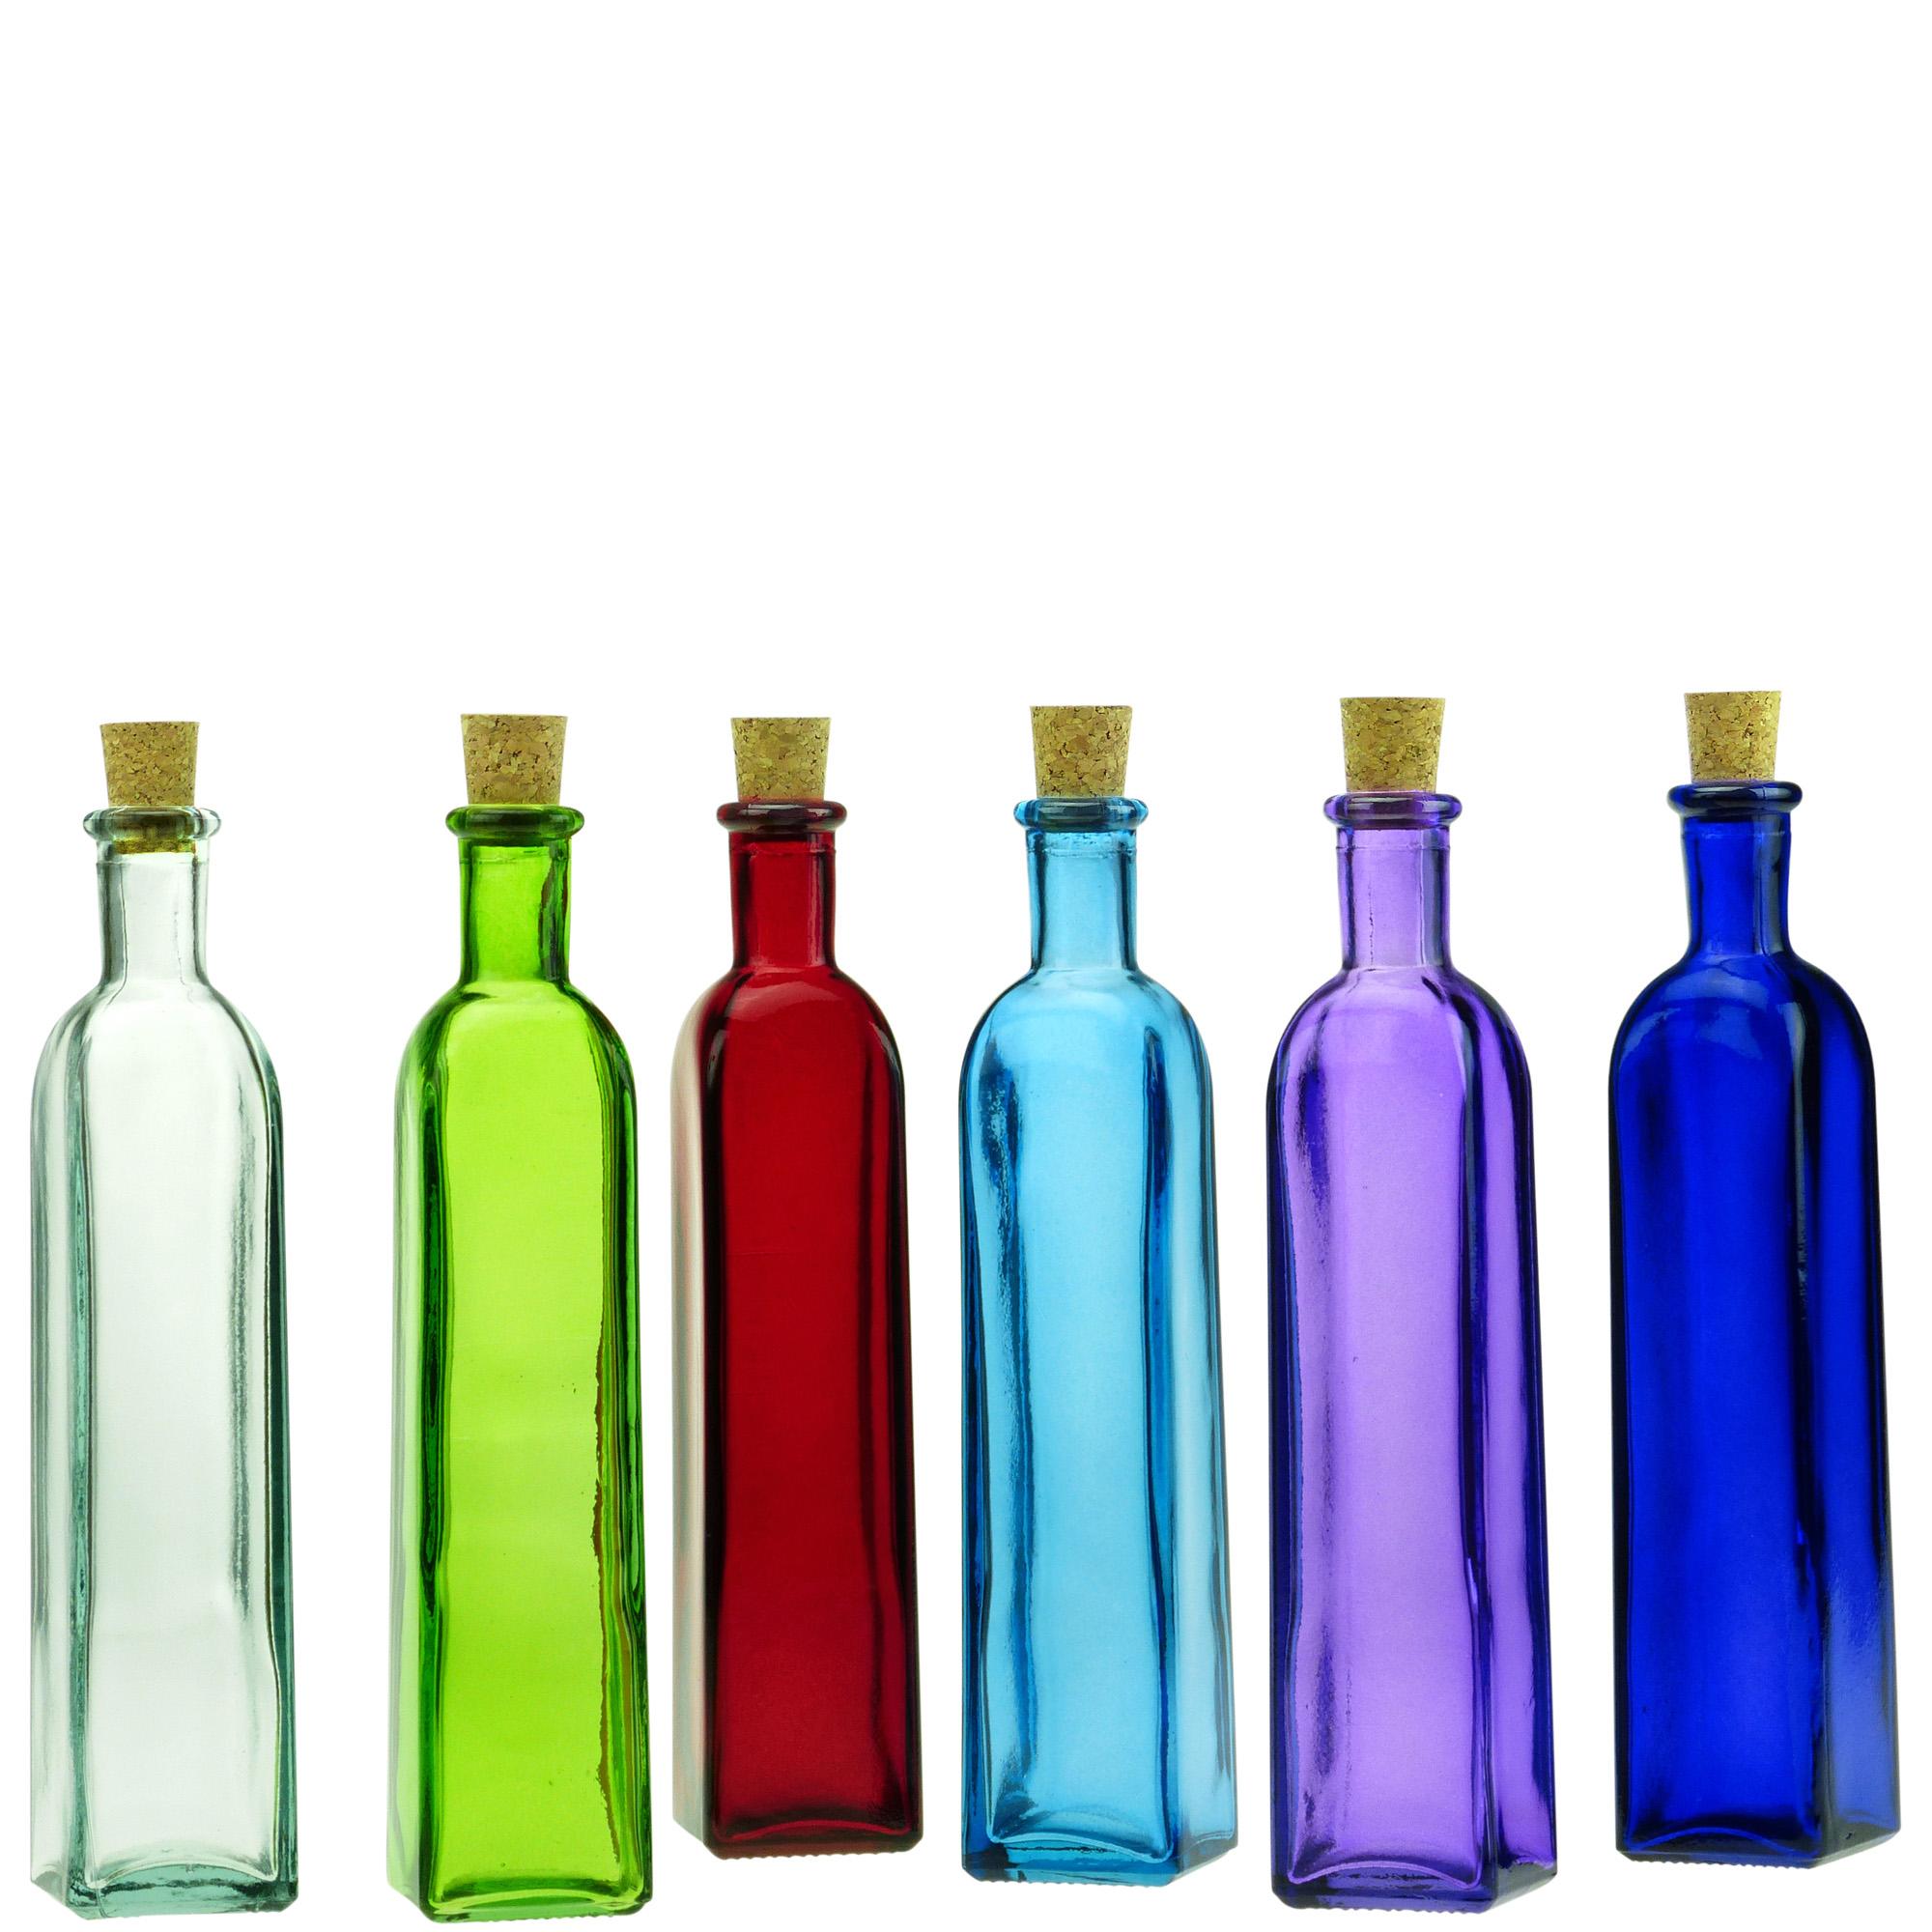 1589409e38e5 Details about Couronne Co Rectangle Glass Bottle, G5314, 12 Ounce Capacity